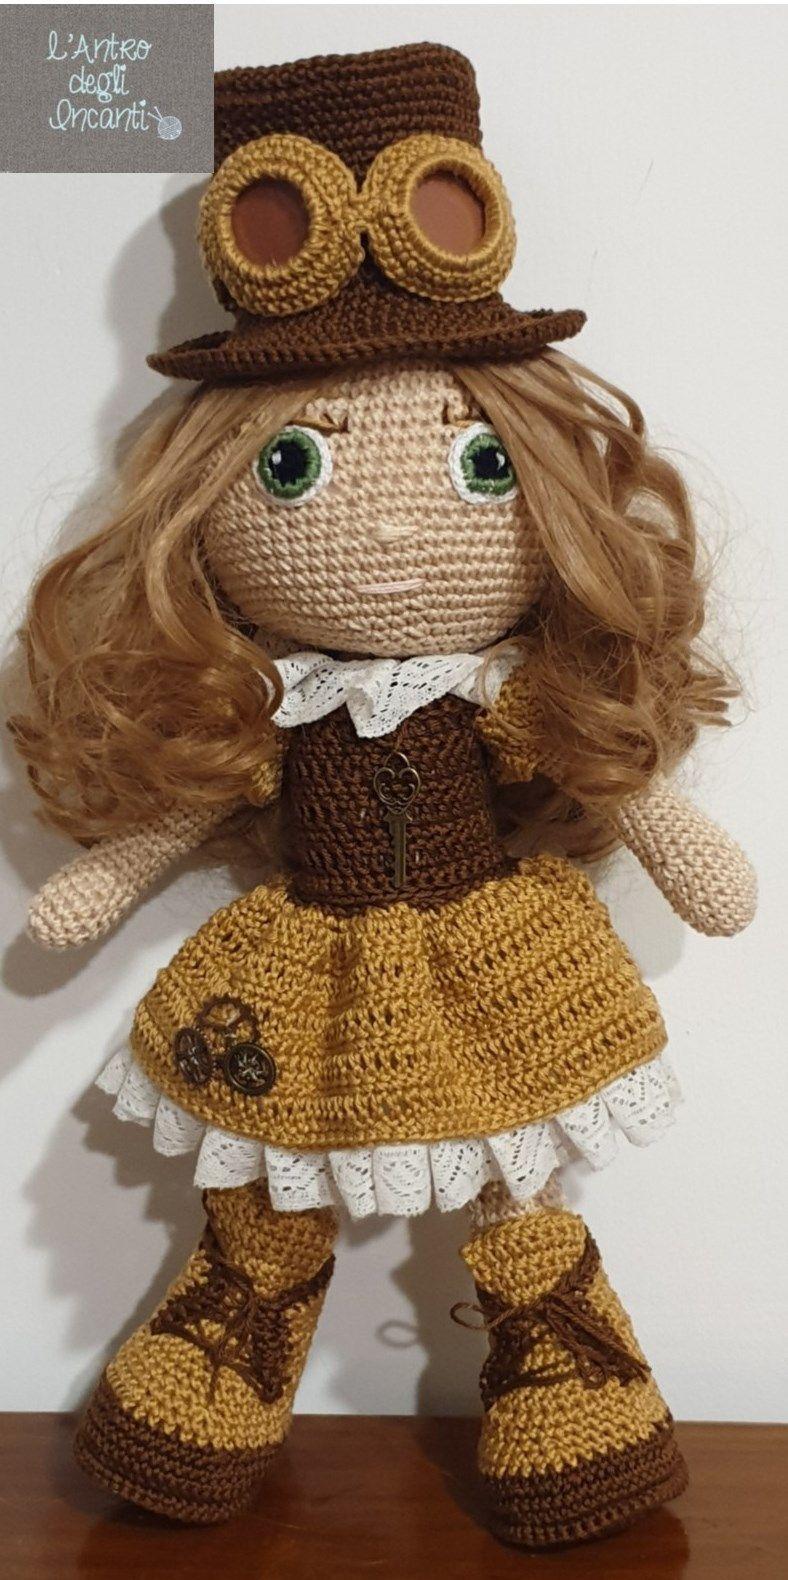 Bambola amigurumi steampunk Emmeline crochet uncinetto | Etsy | Crochet  hats, Crochet, Steampunk